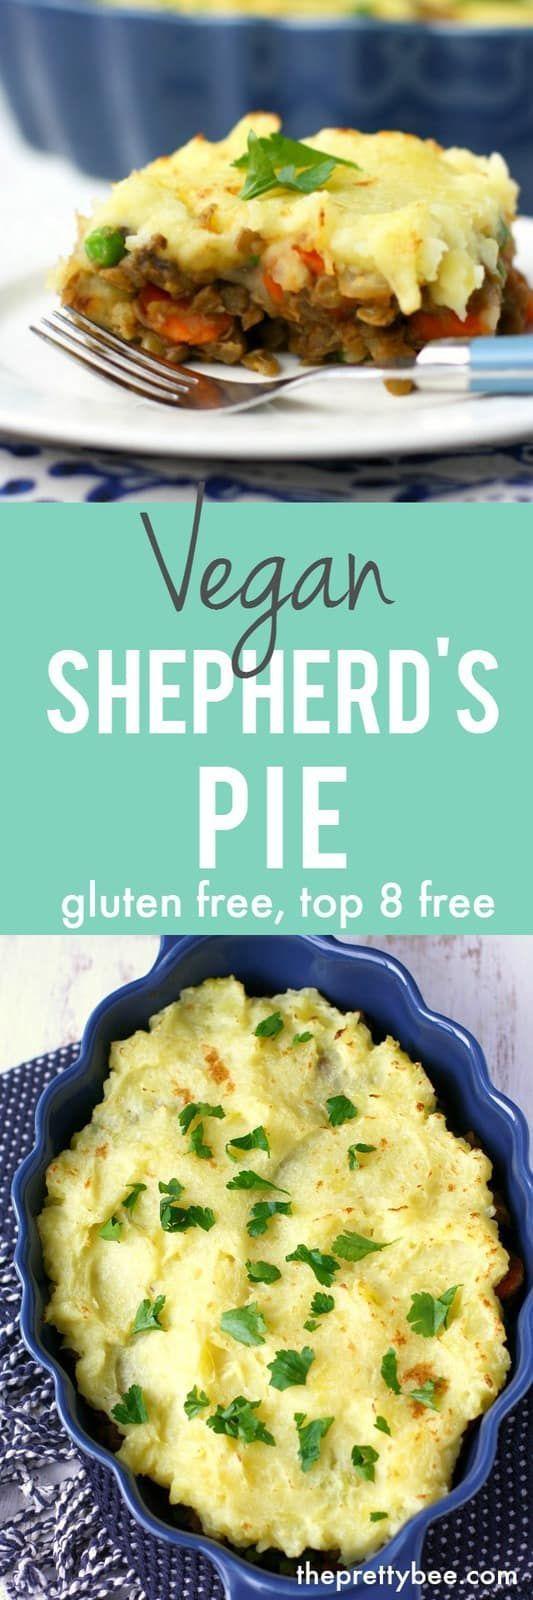 Low Carb Vegan Shepherd's Pie.